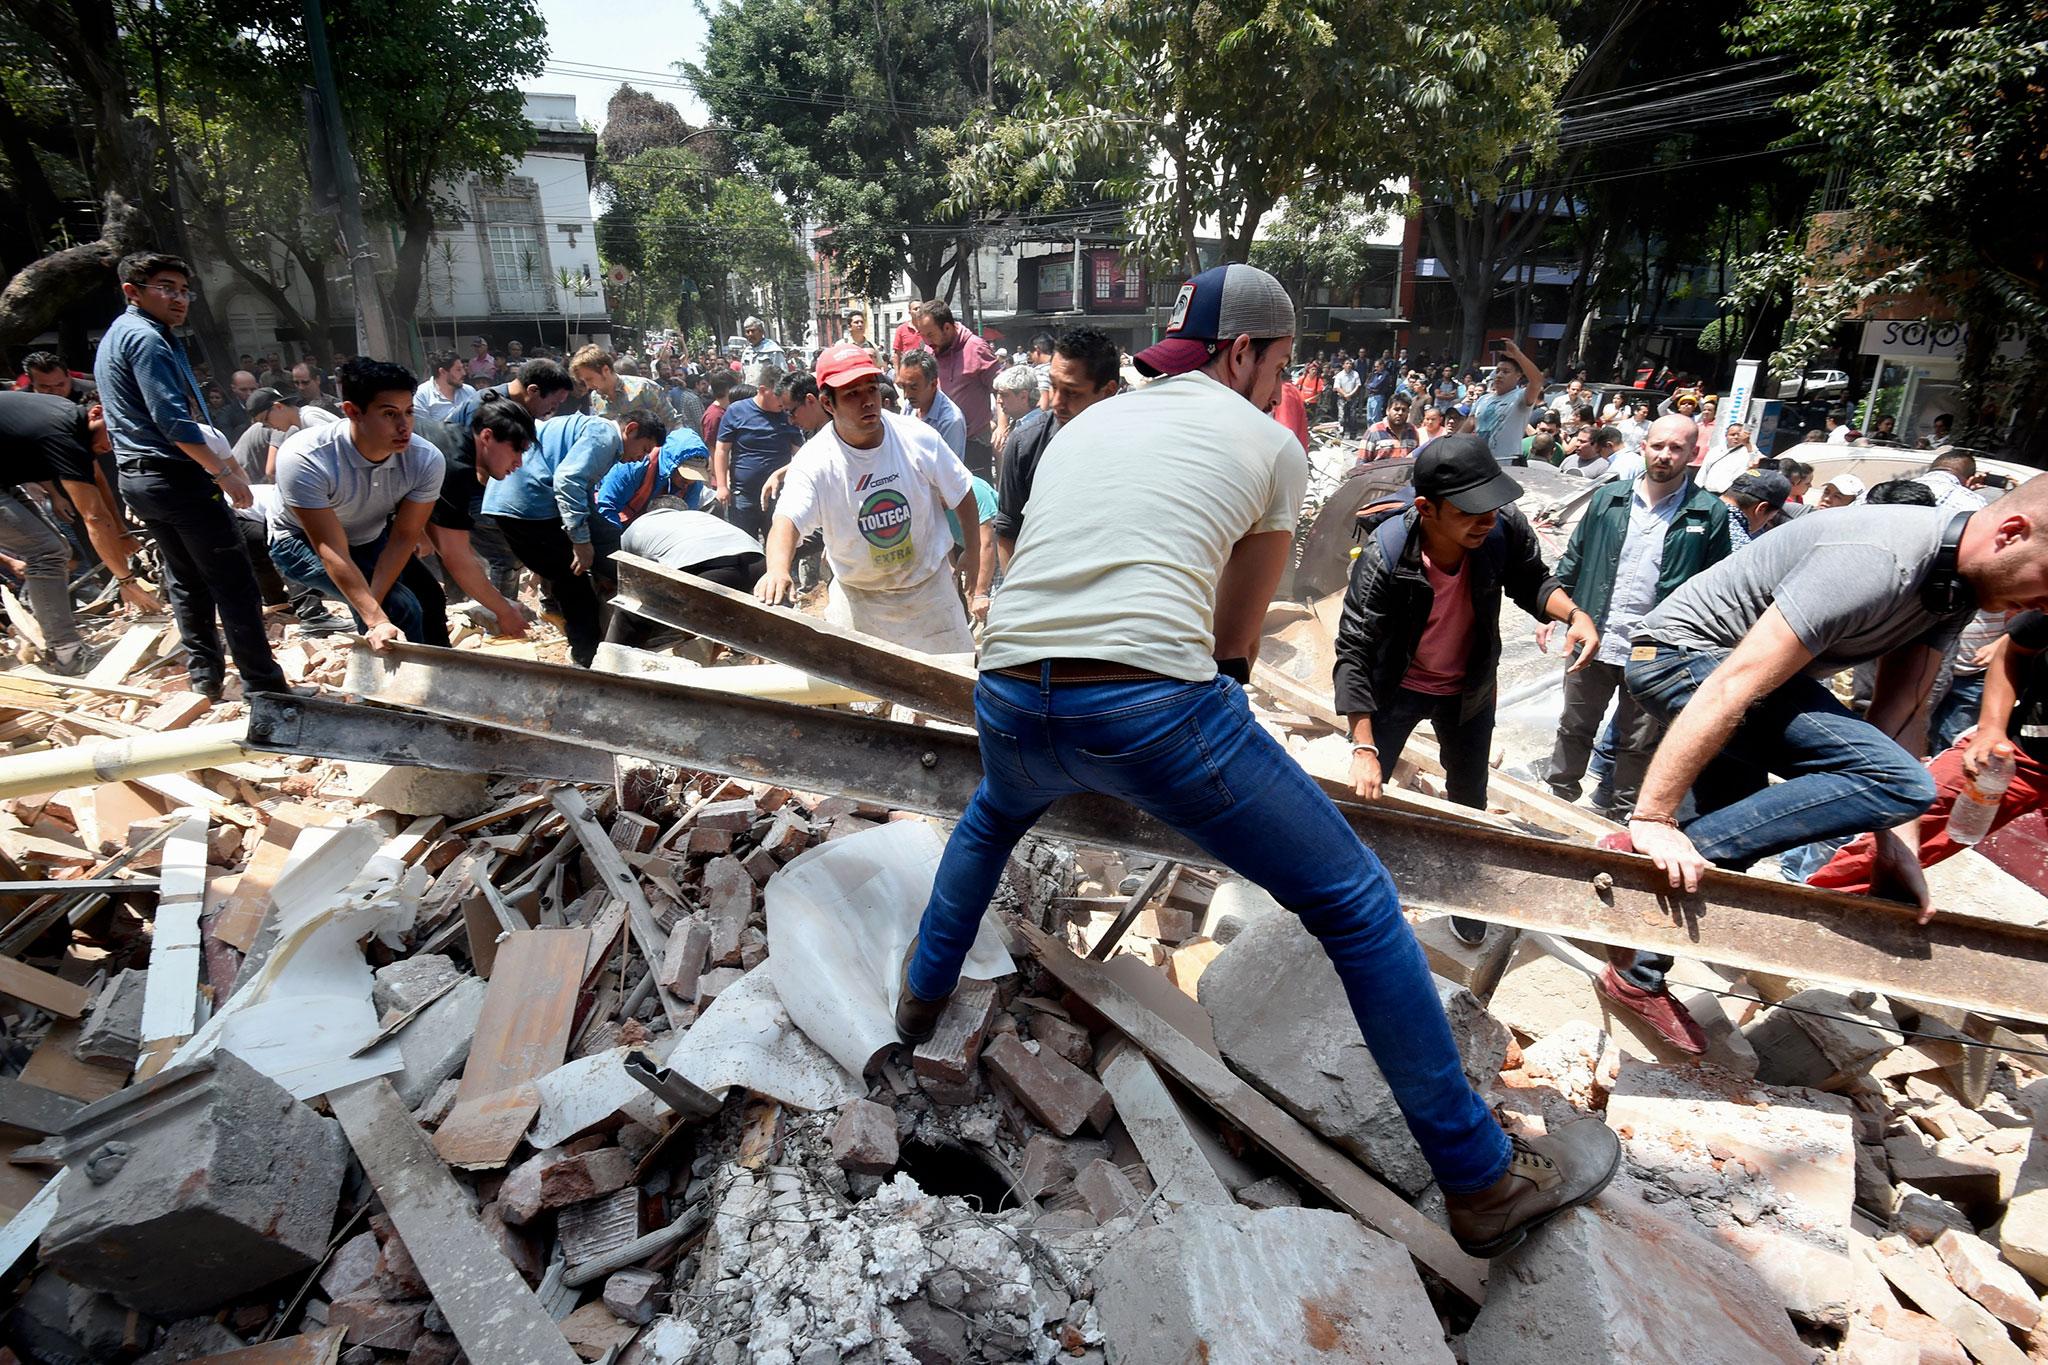 Mexico-city-earthquake-aid